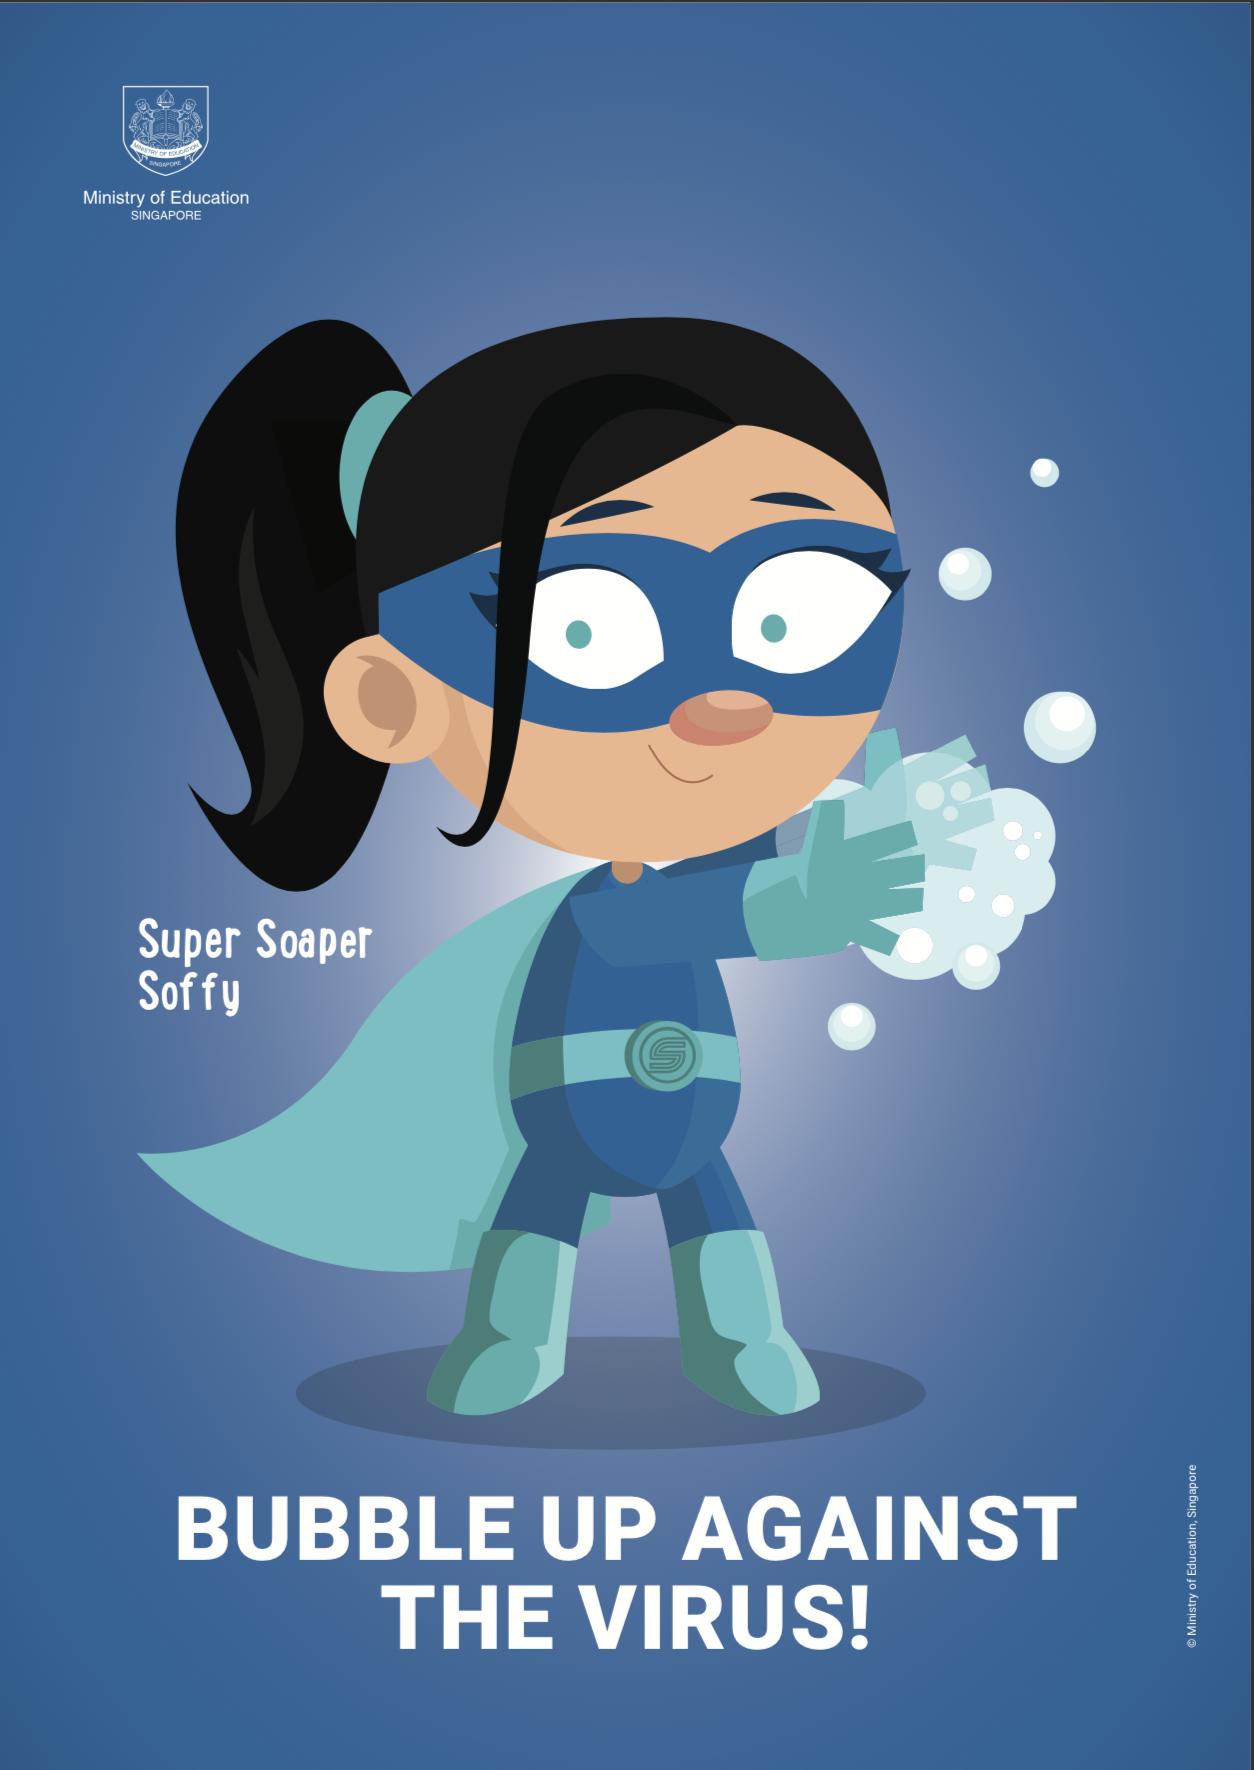 Mrs. Biete's Motivational Poster  - Bubble Up Against The Virus!